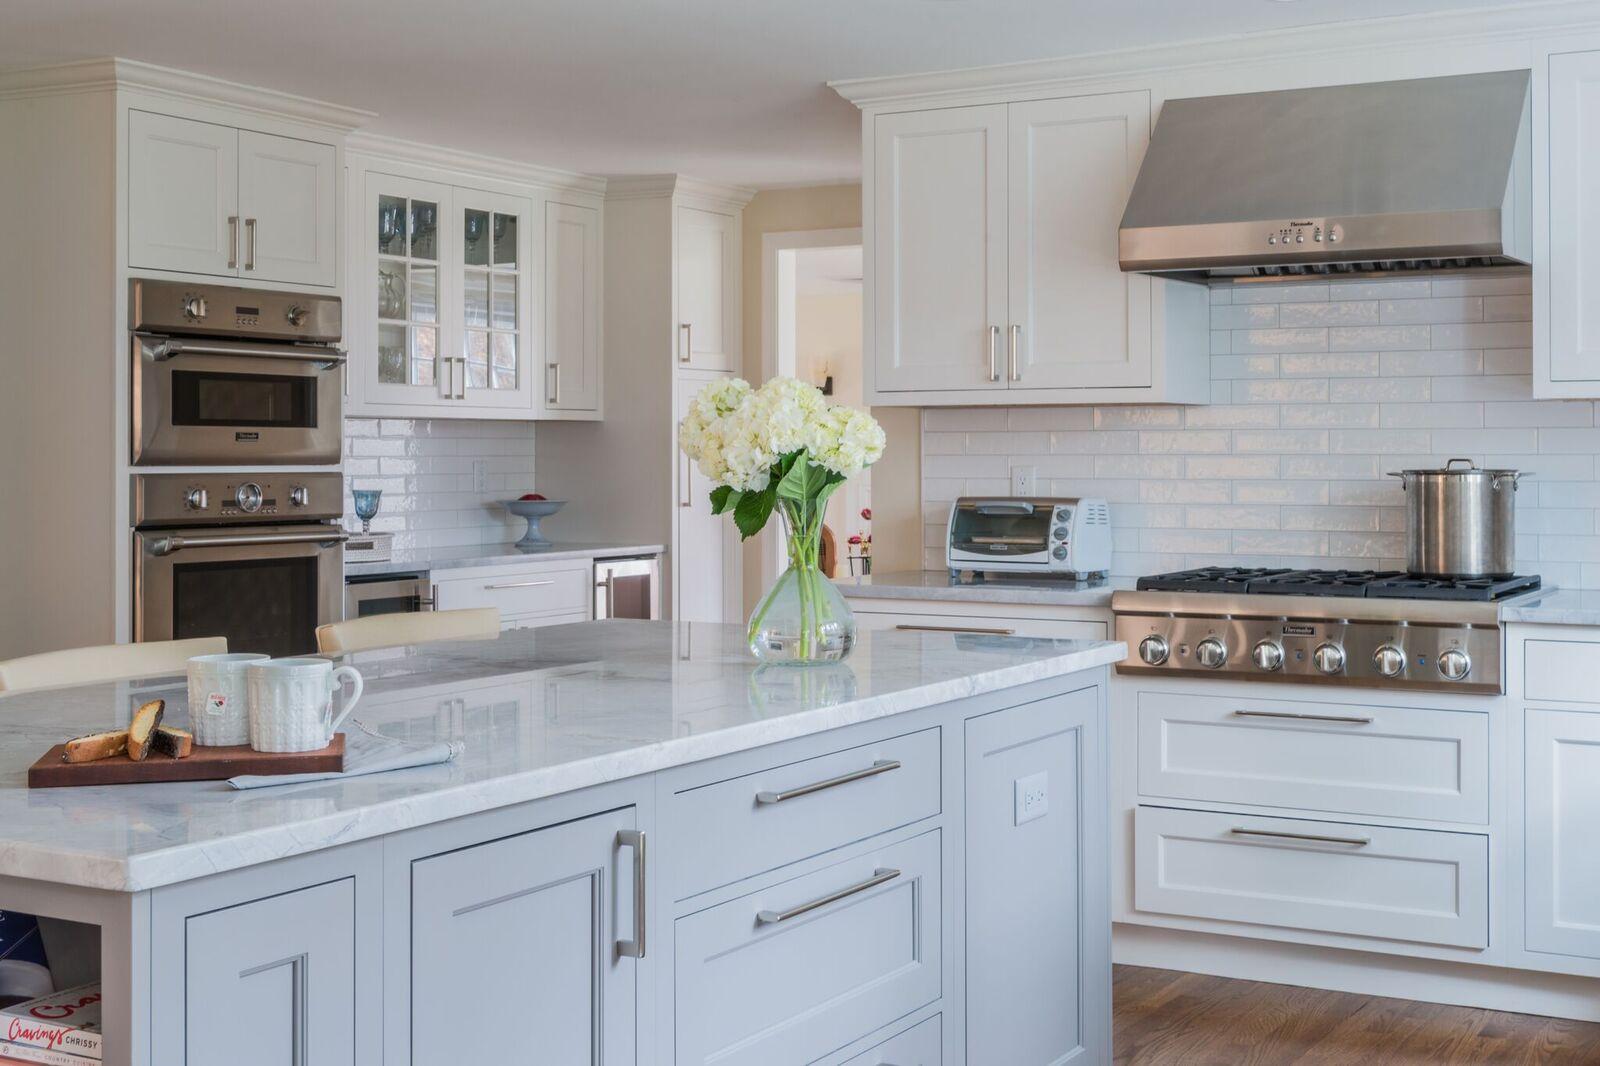 Pic 4 Kitchen stove island.jpg